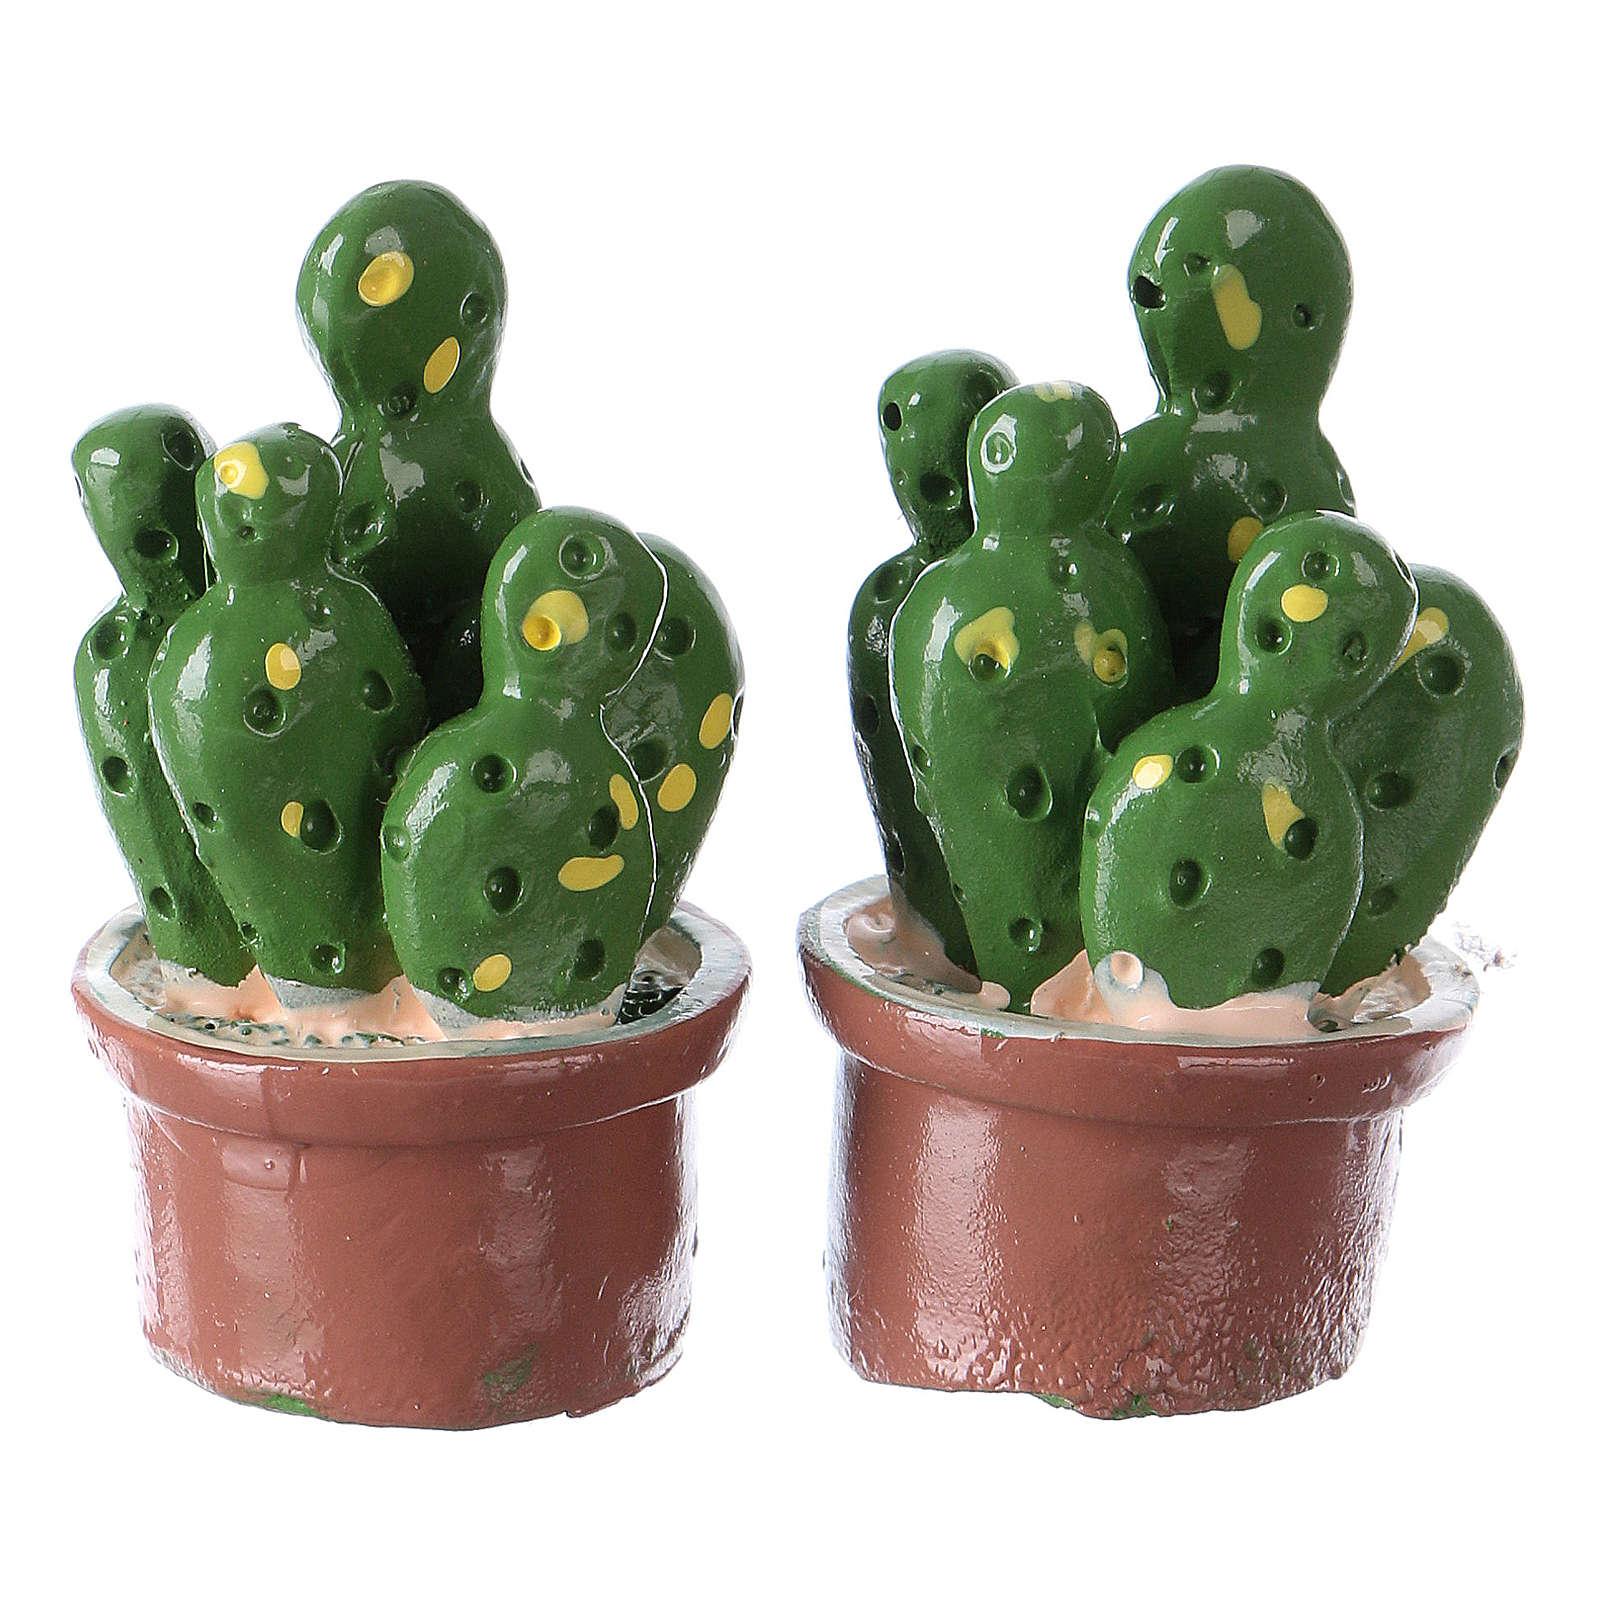 Vase and plant 2-piece-set 3x2x2 cm in resin for Nativity Scene 4